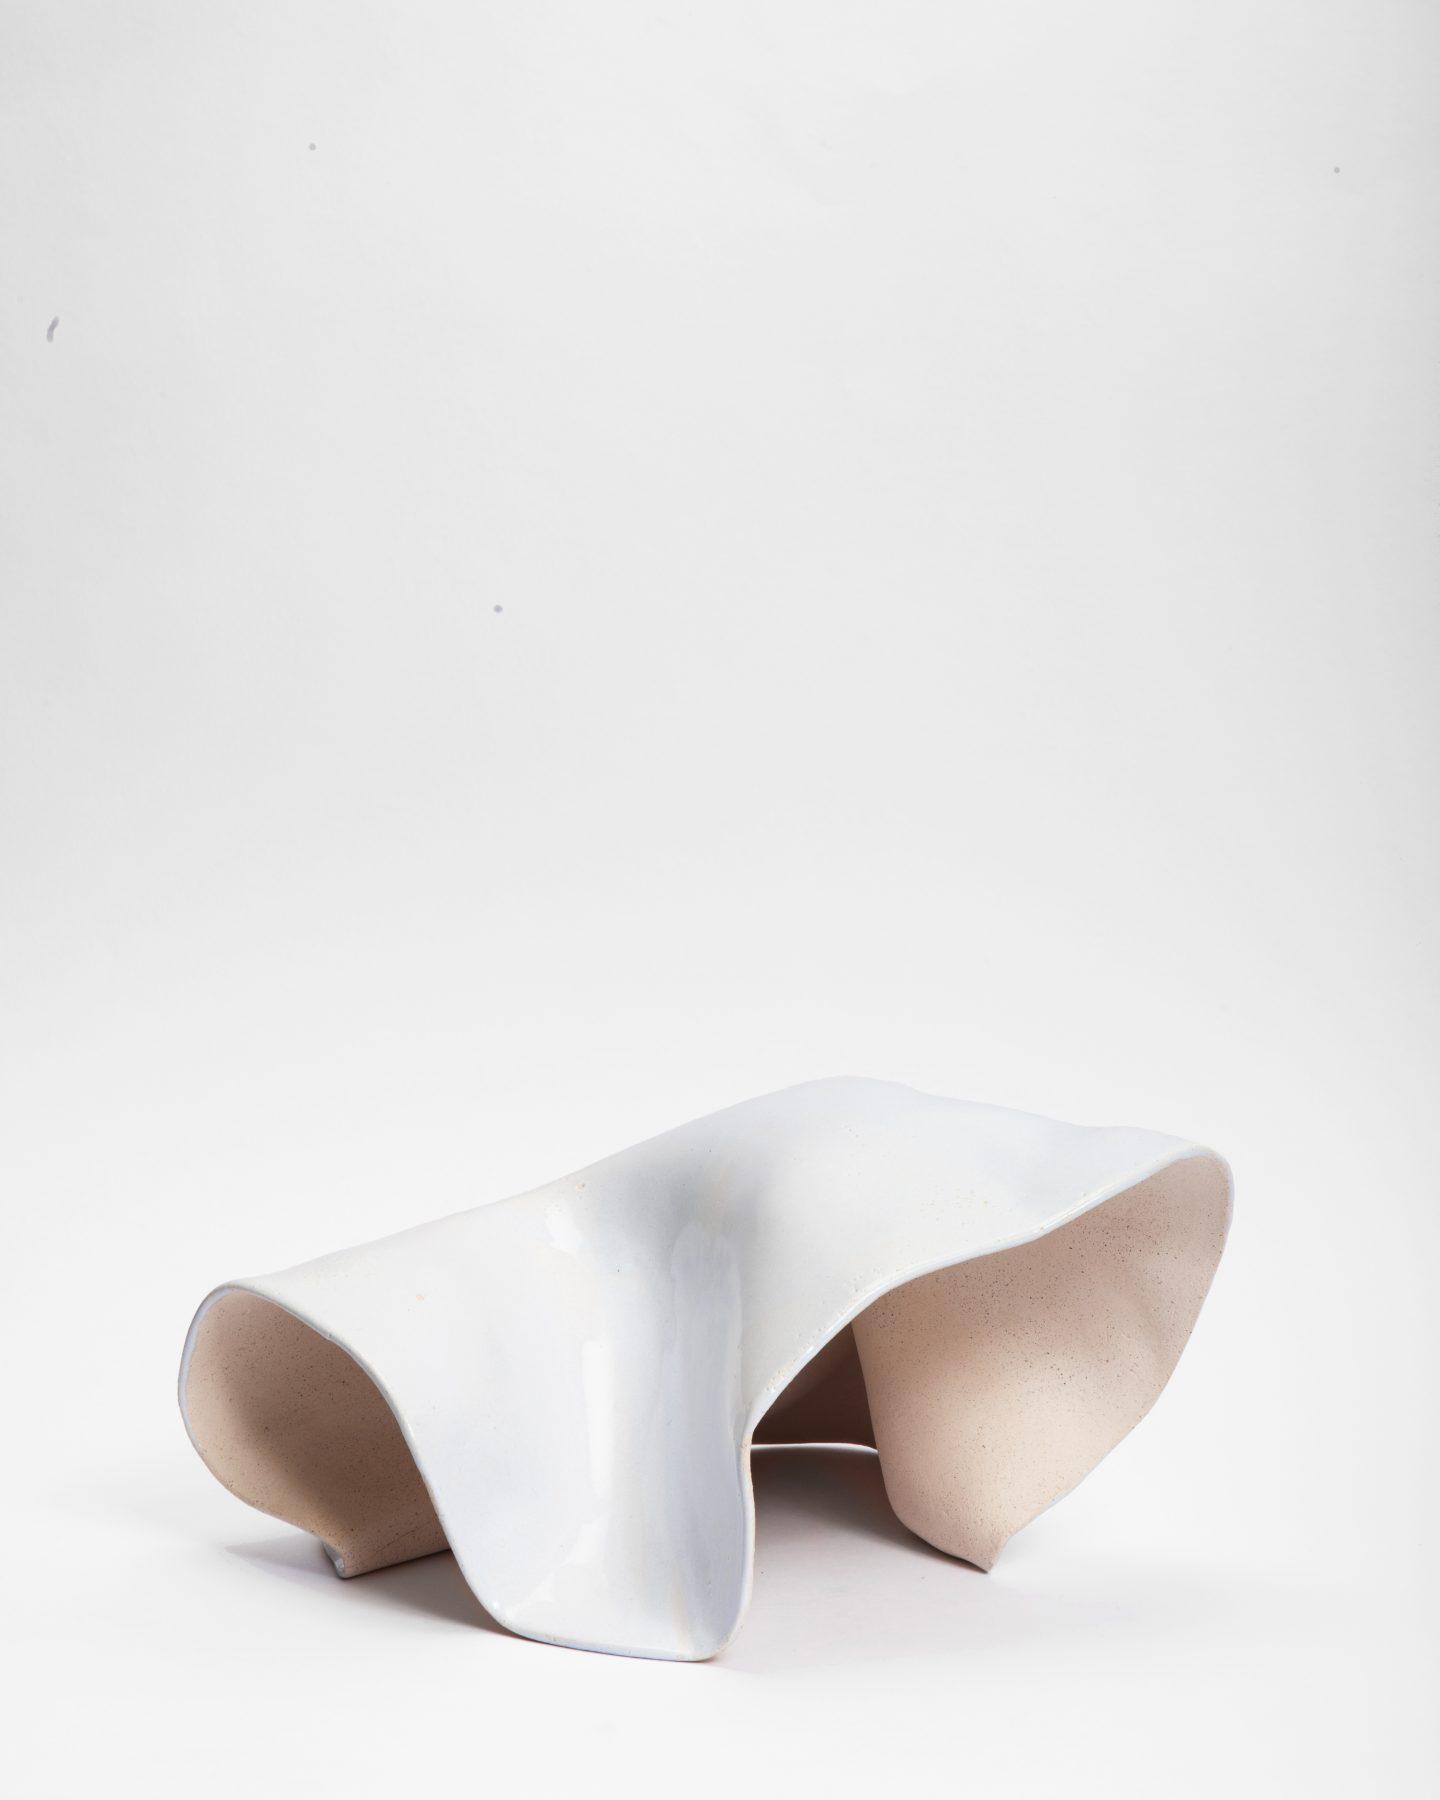 IGNANT-Photography-Federico-Clavarino-Eel-Soup-015